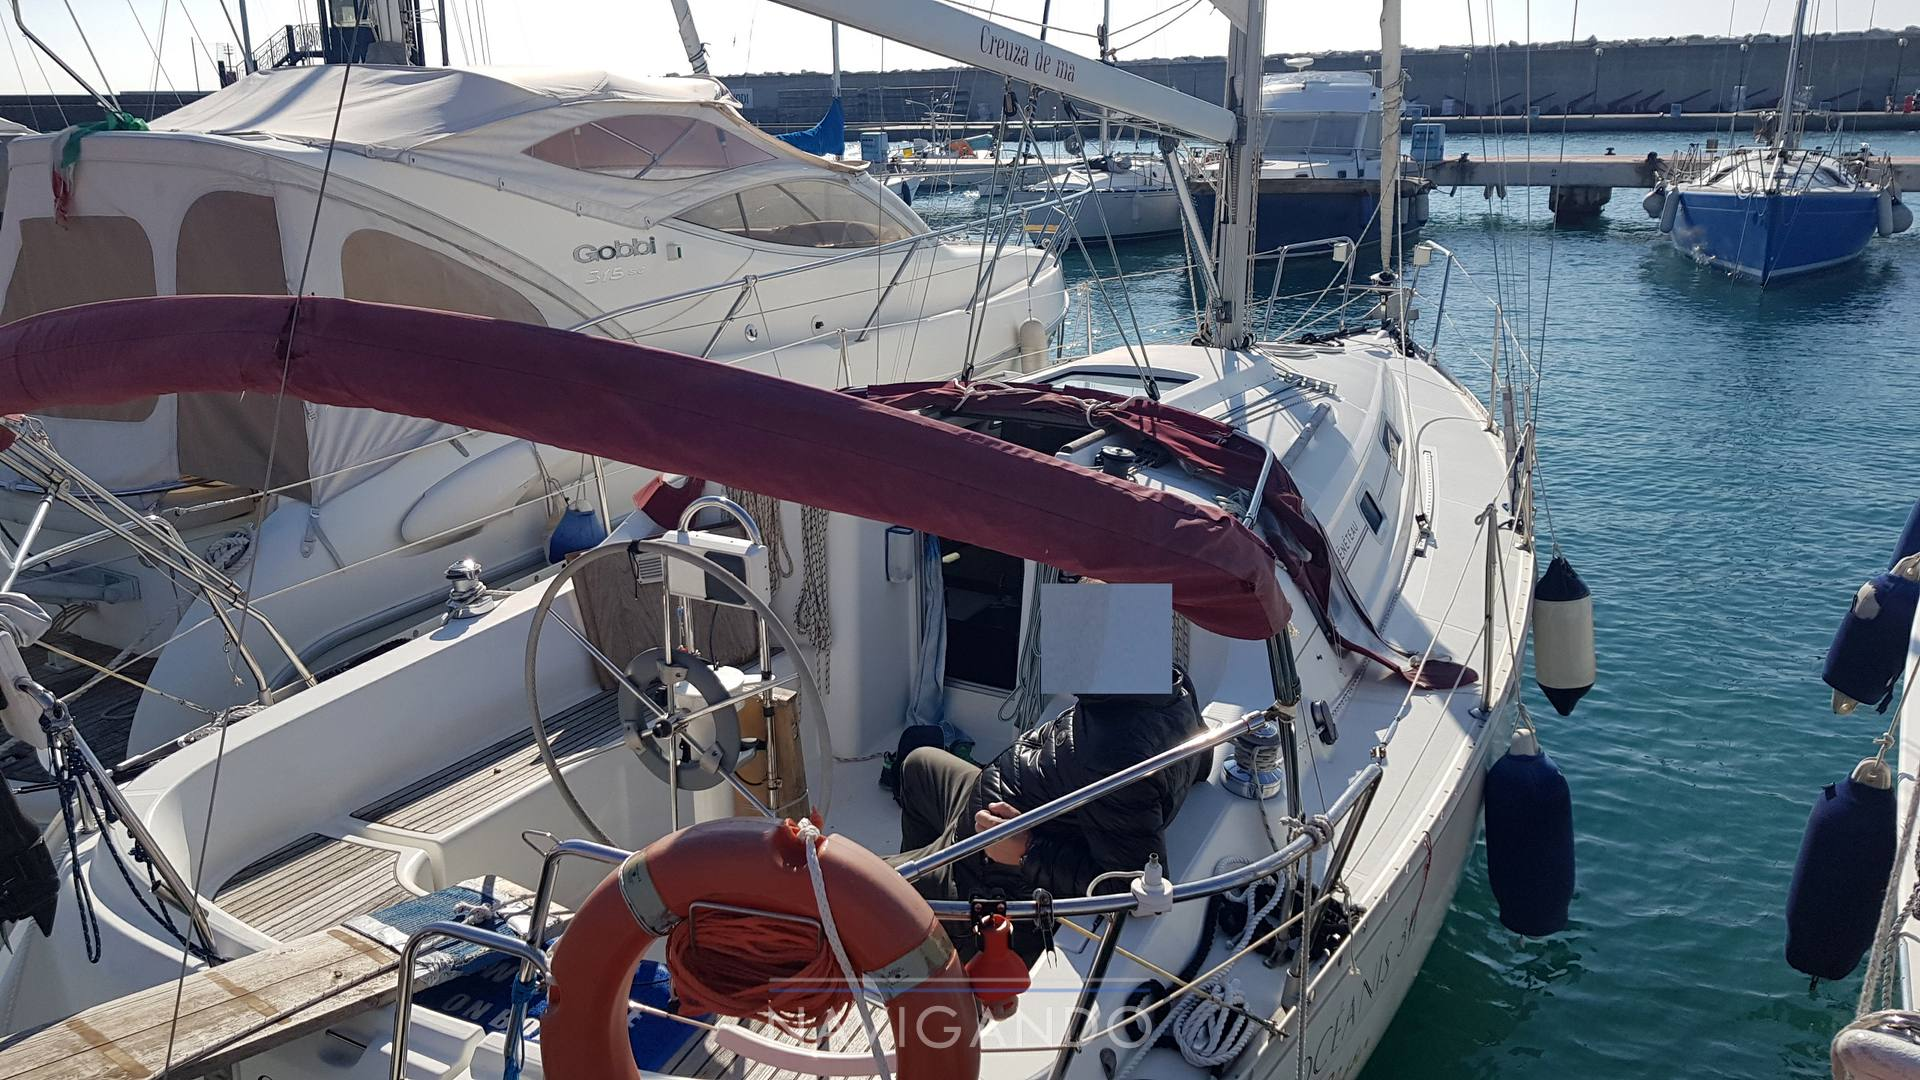 Beneteau Oceanis 311 barco de vela